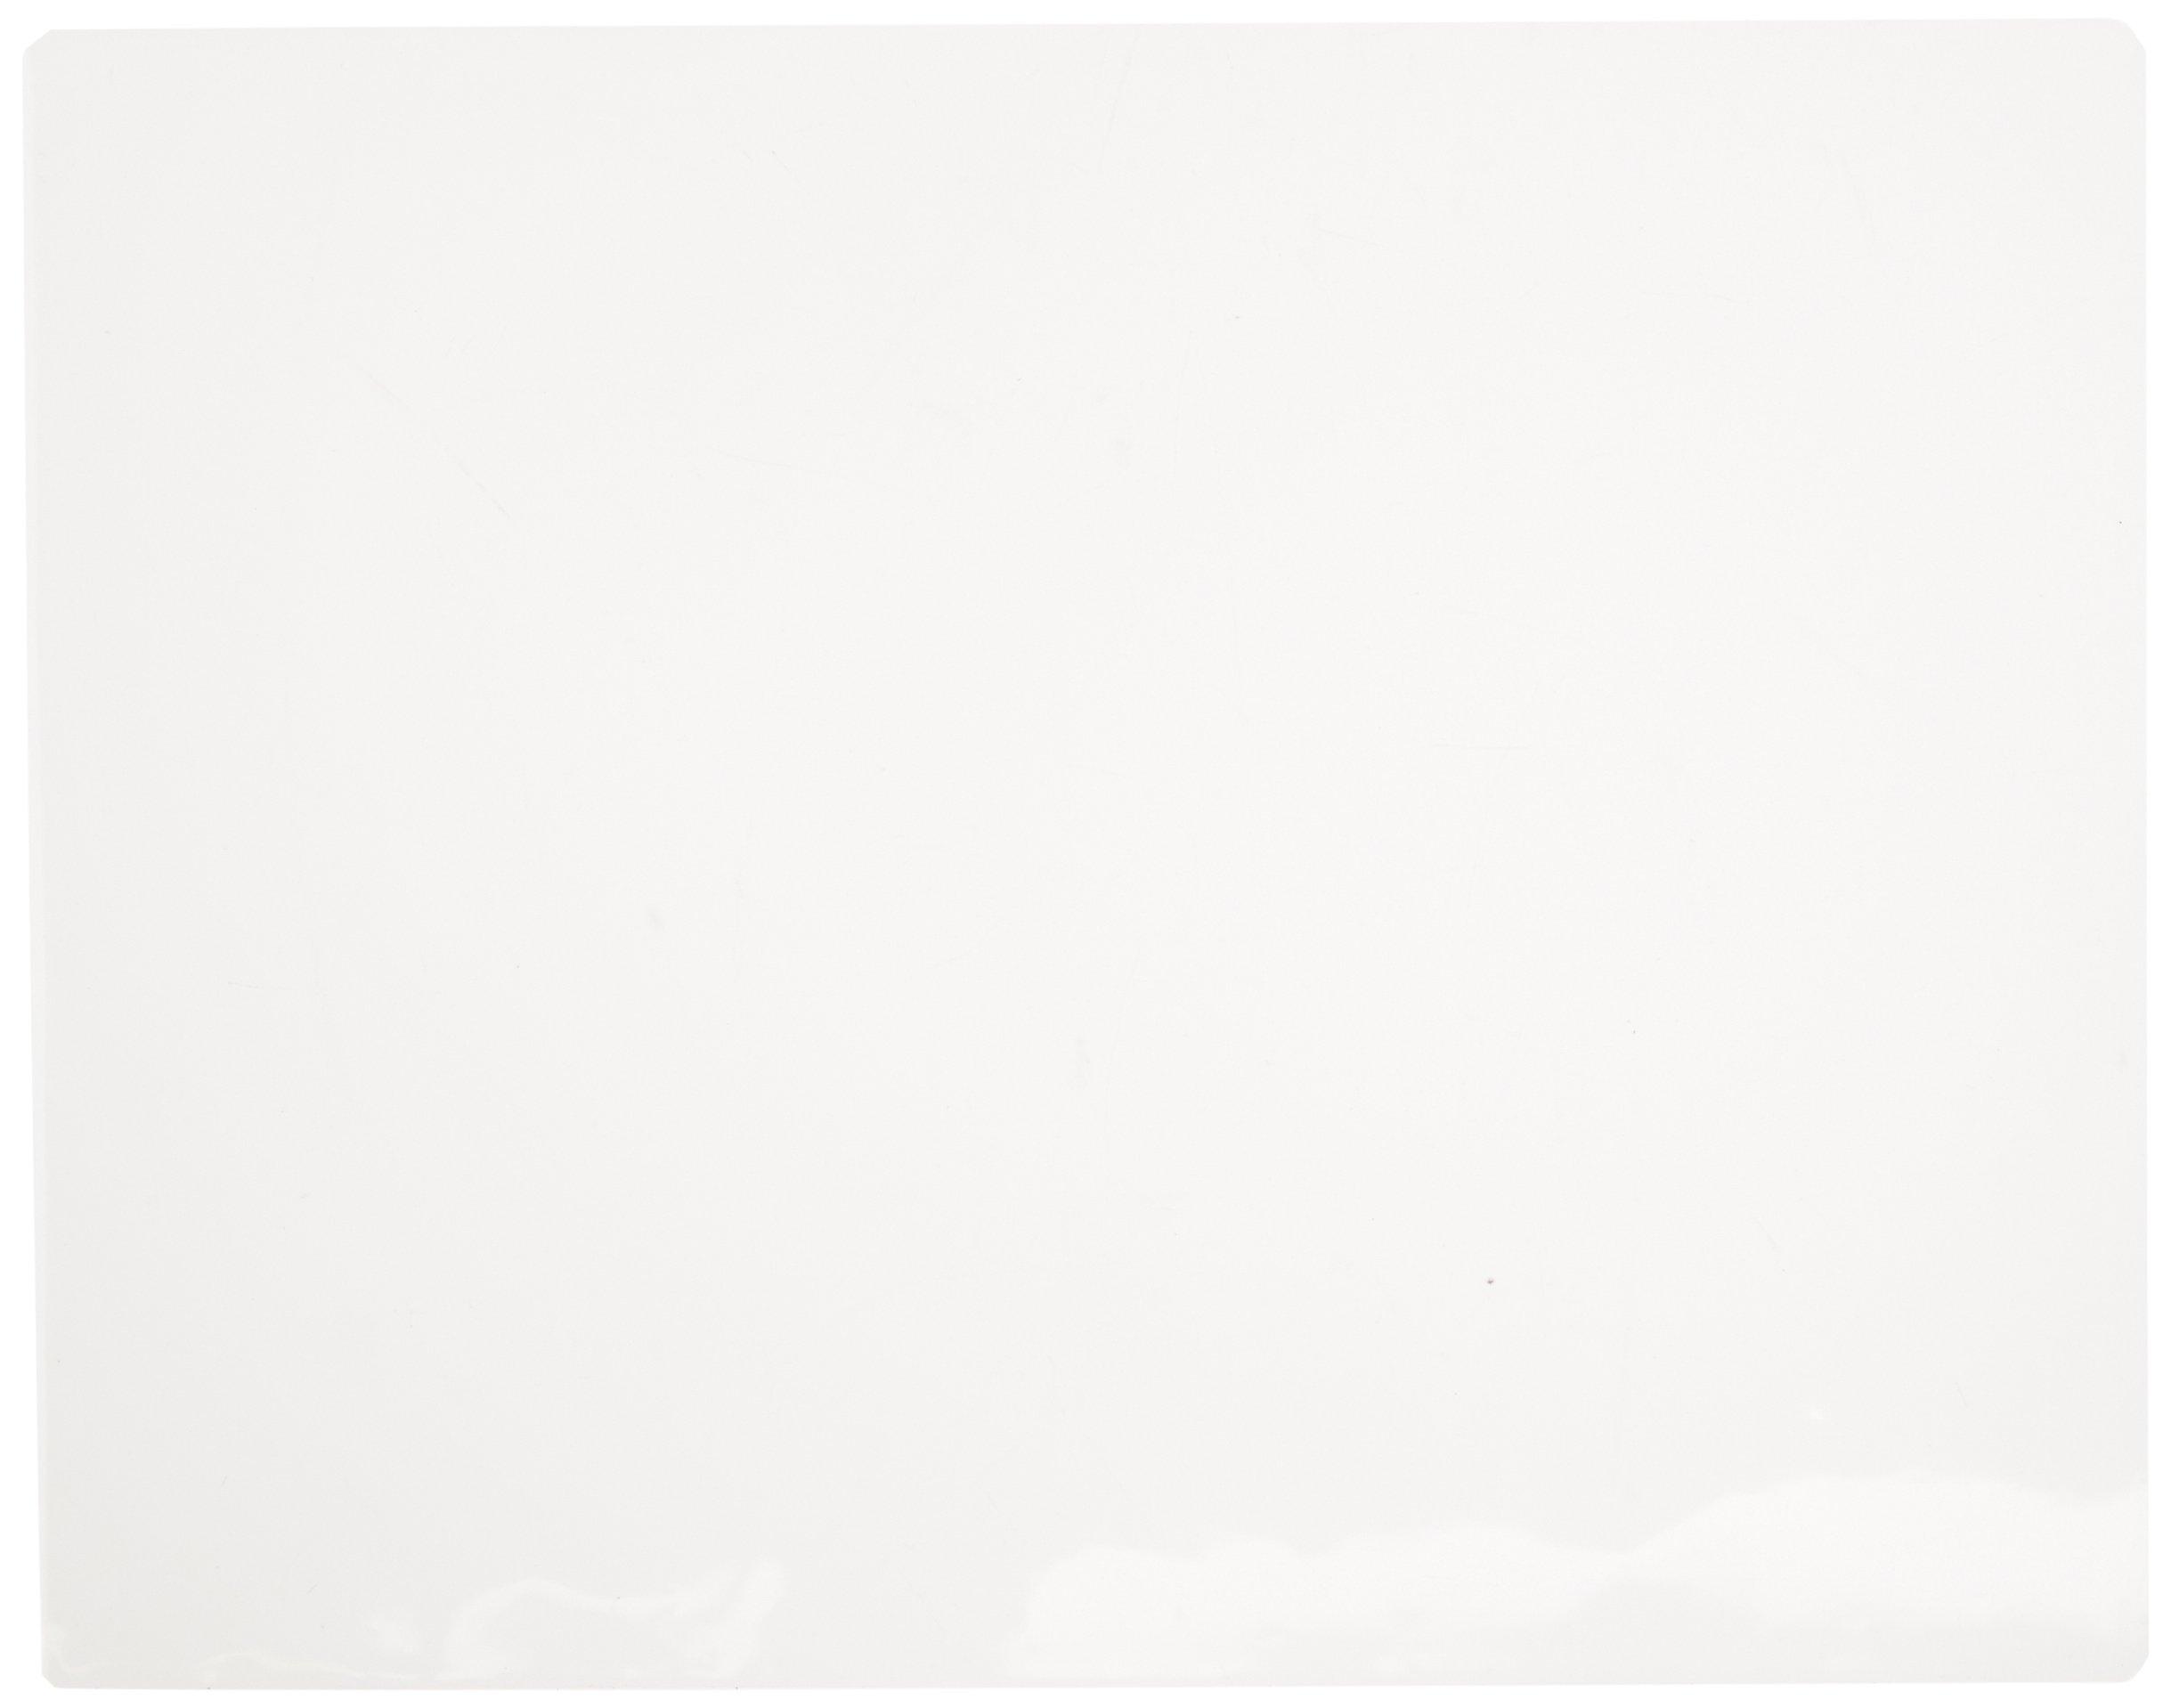 American Crafts Plain Minc Lamination Photo Pouches (25 Per Pack), 9'' x 11.5''